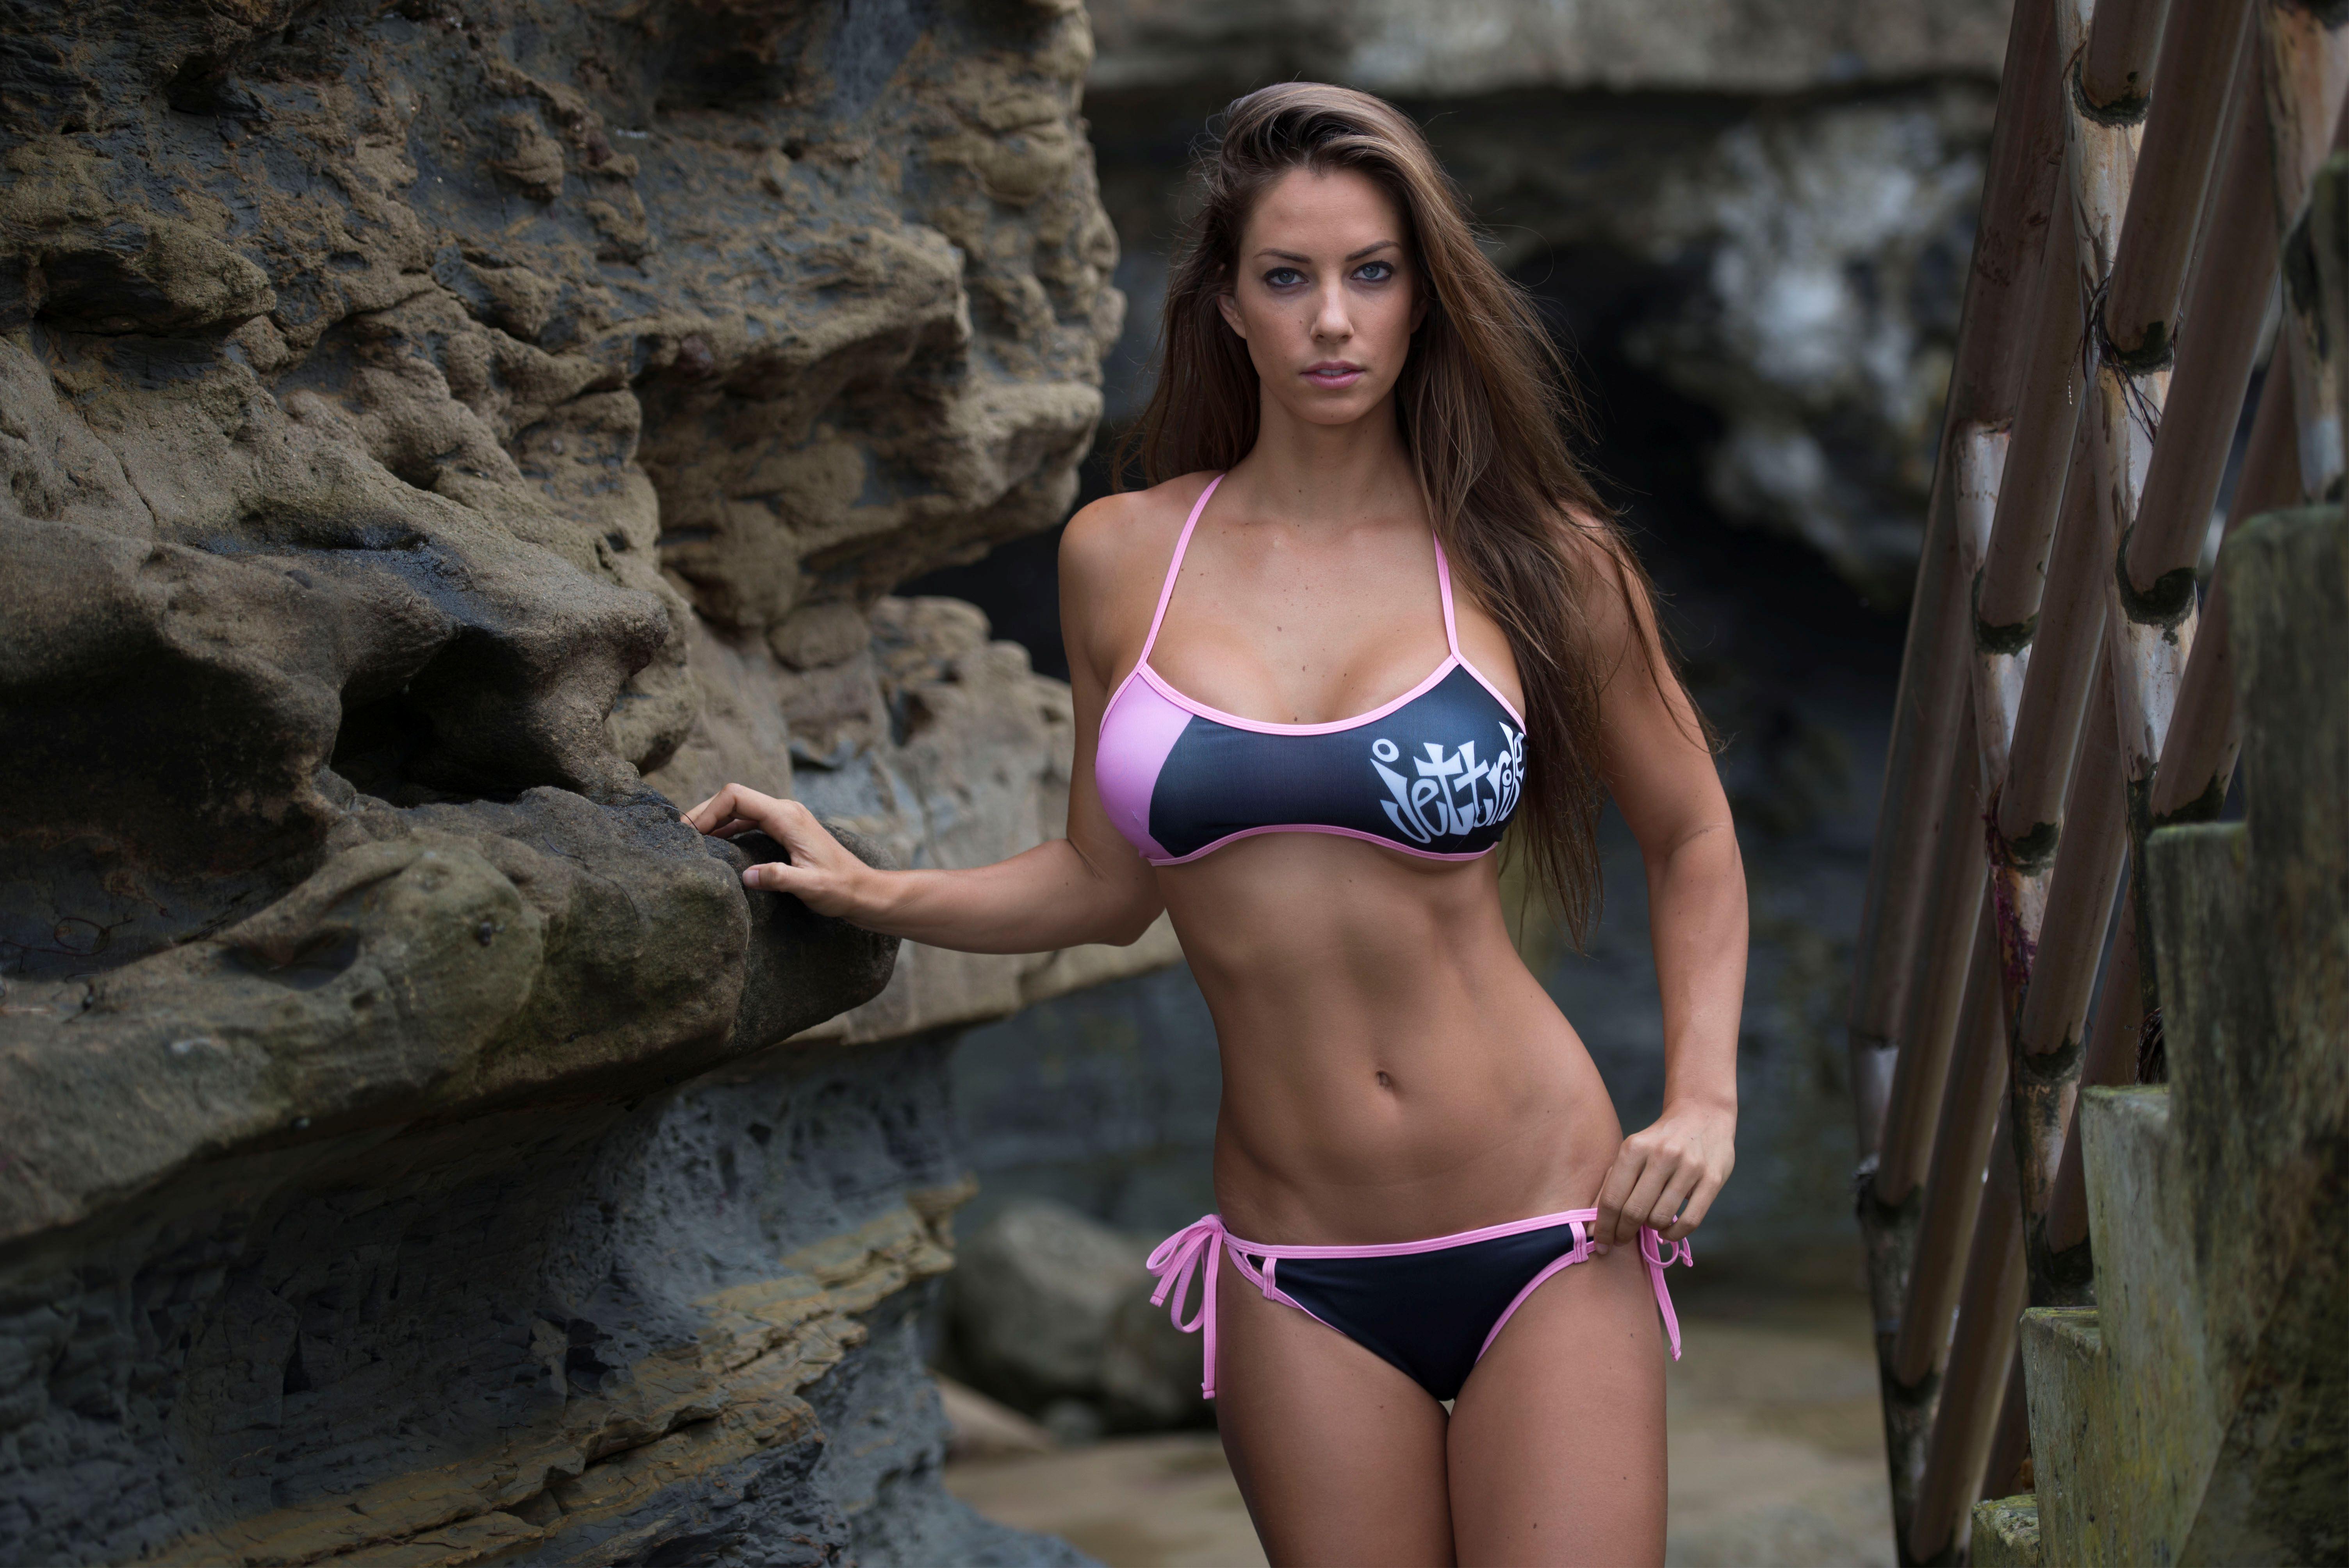 Janna - Sporty Pink Bikini